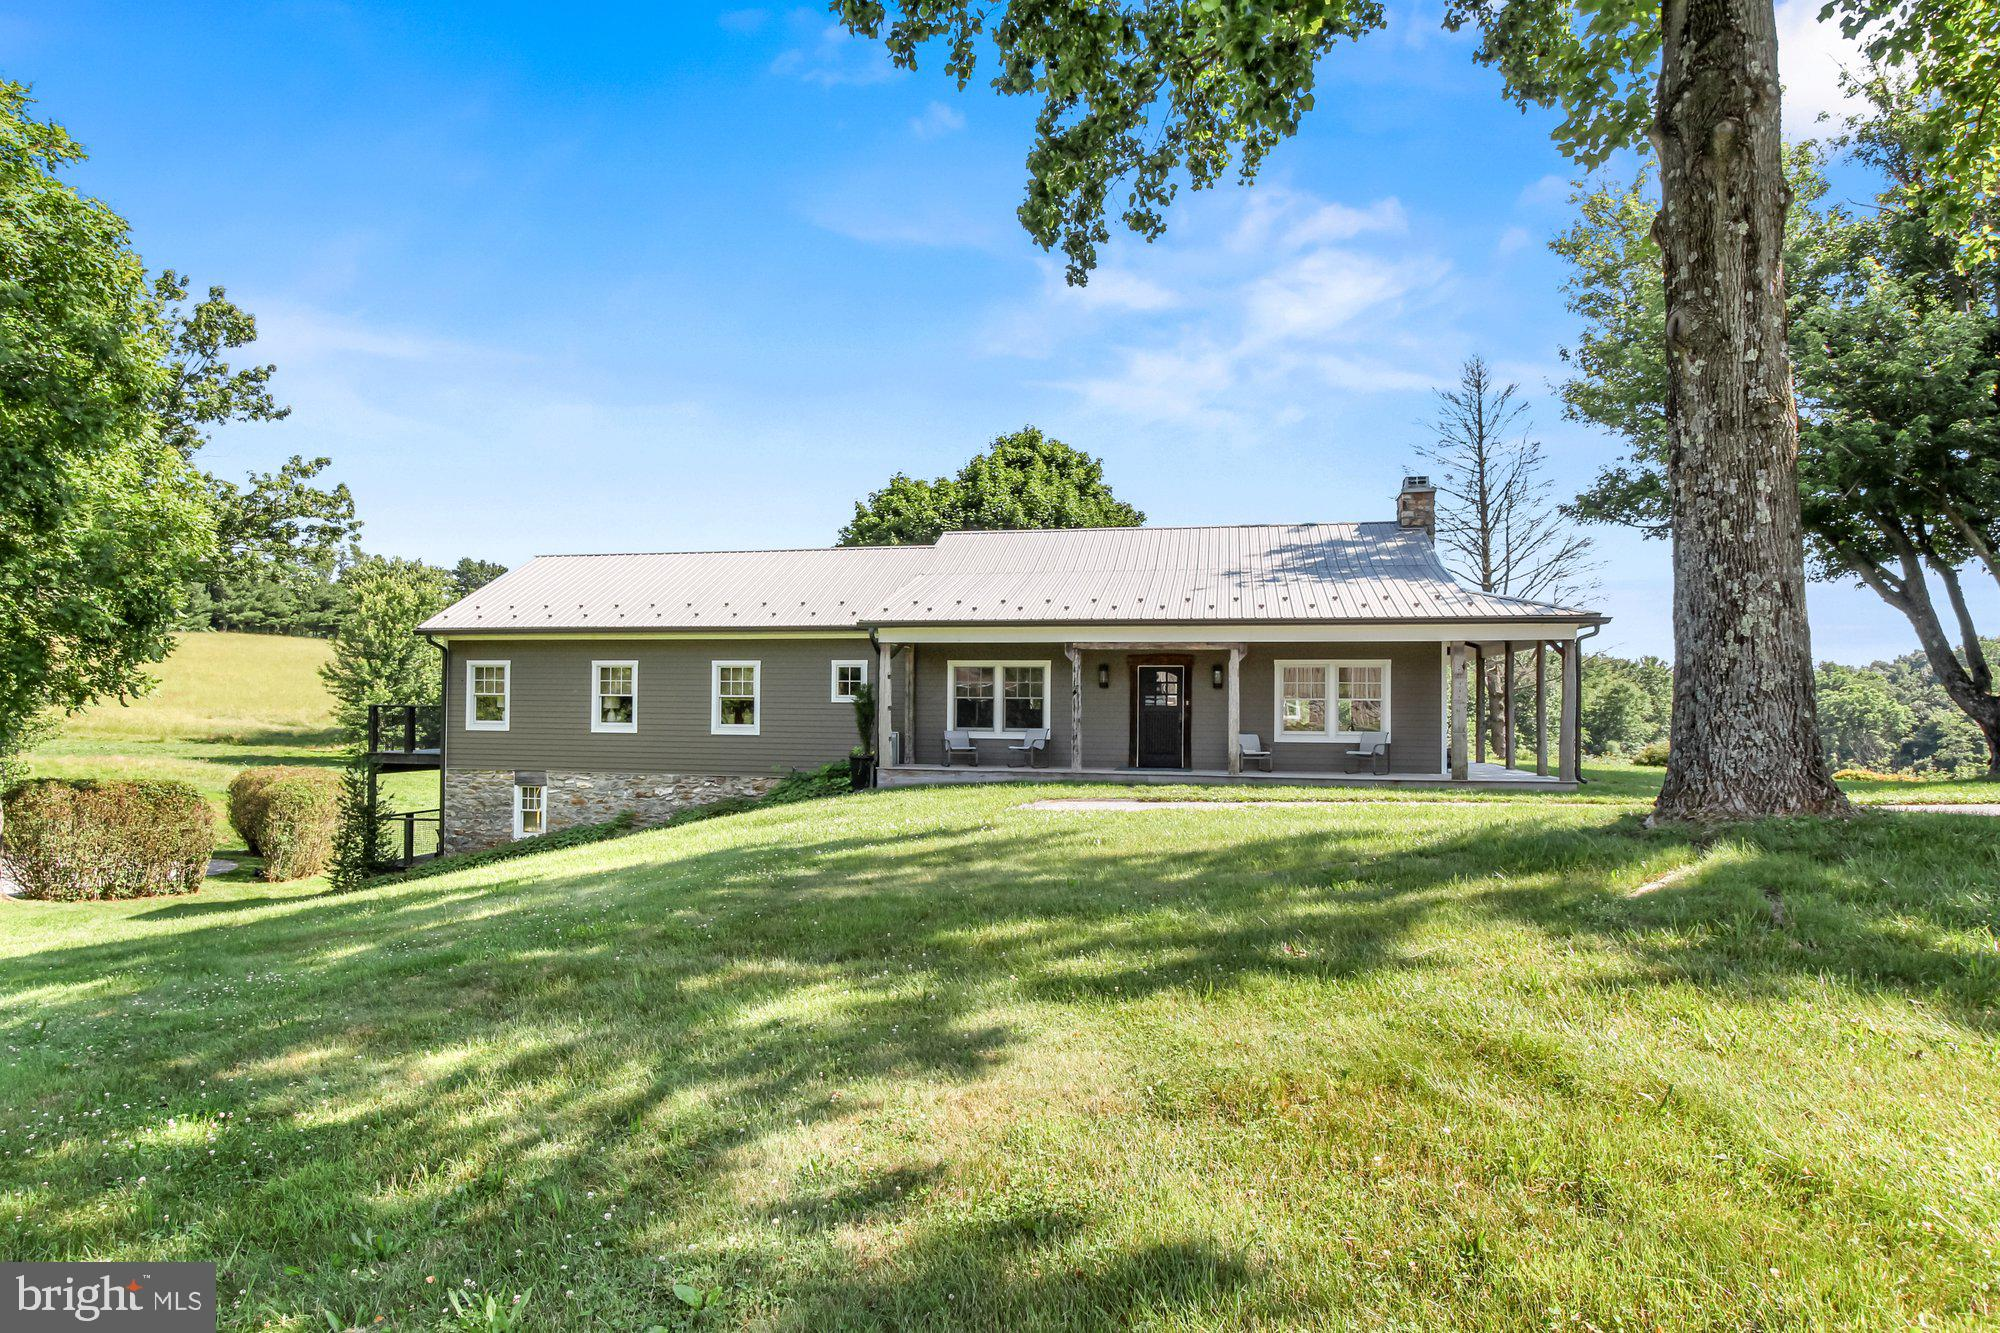 21616 Middletown Rd, Freeland, MD, 21053